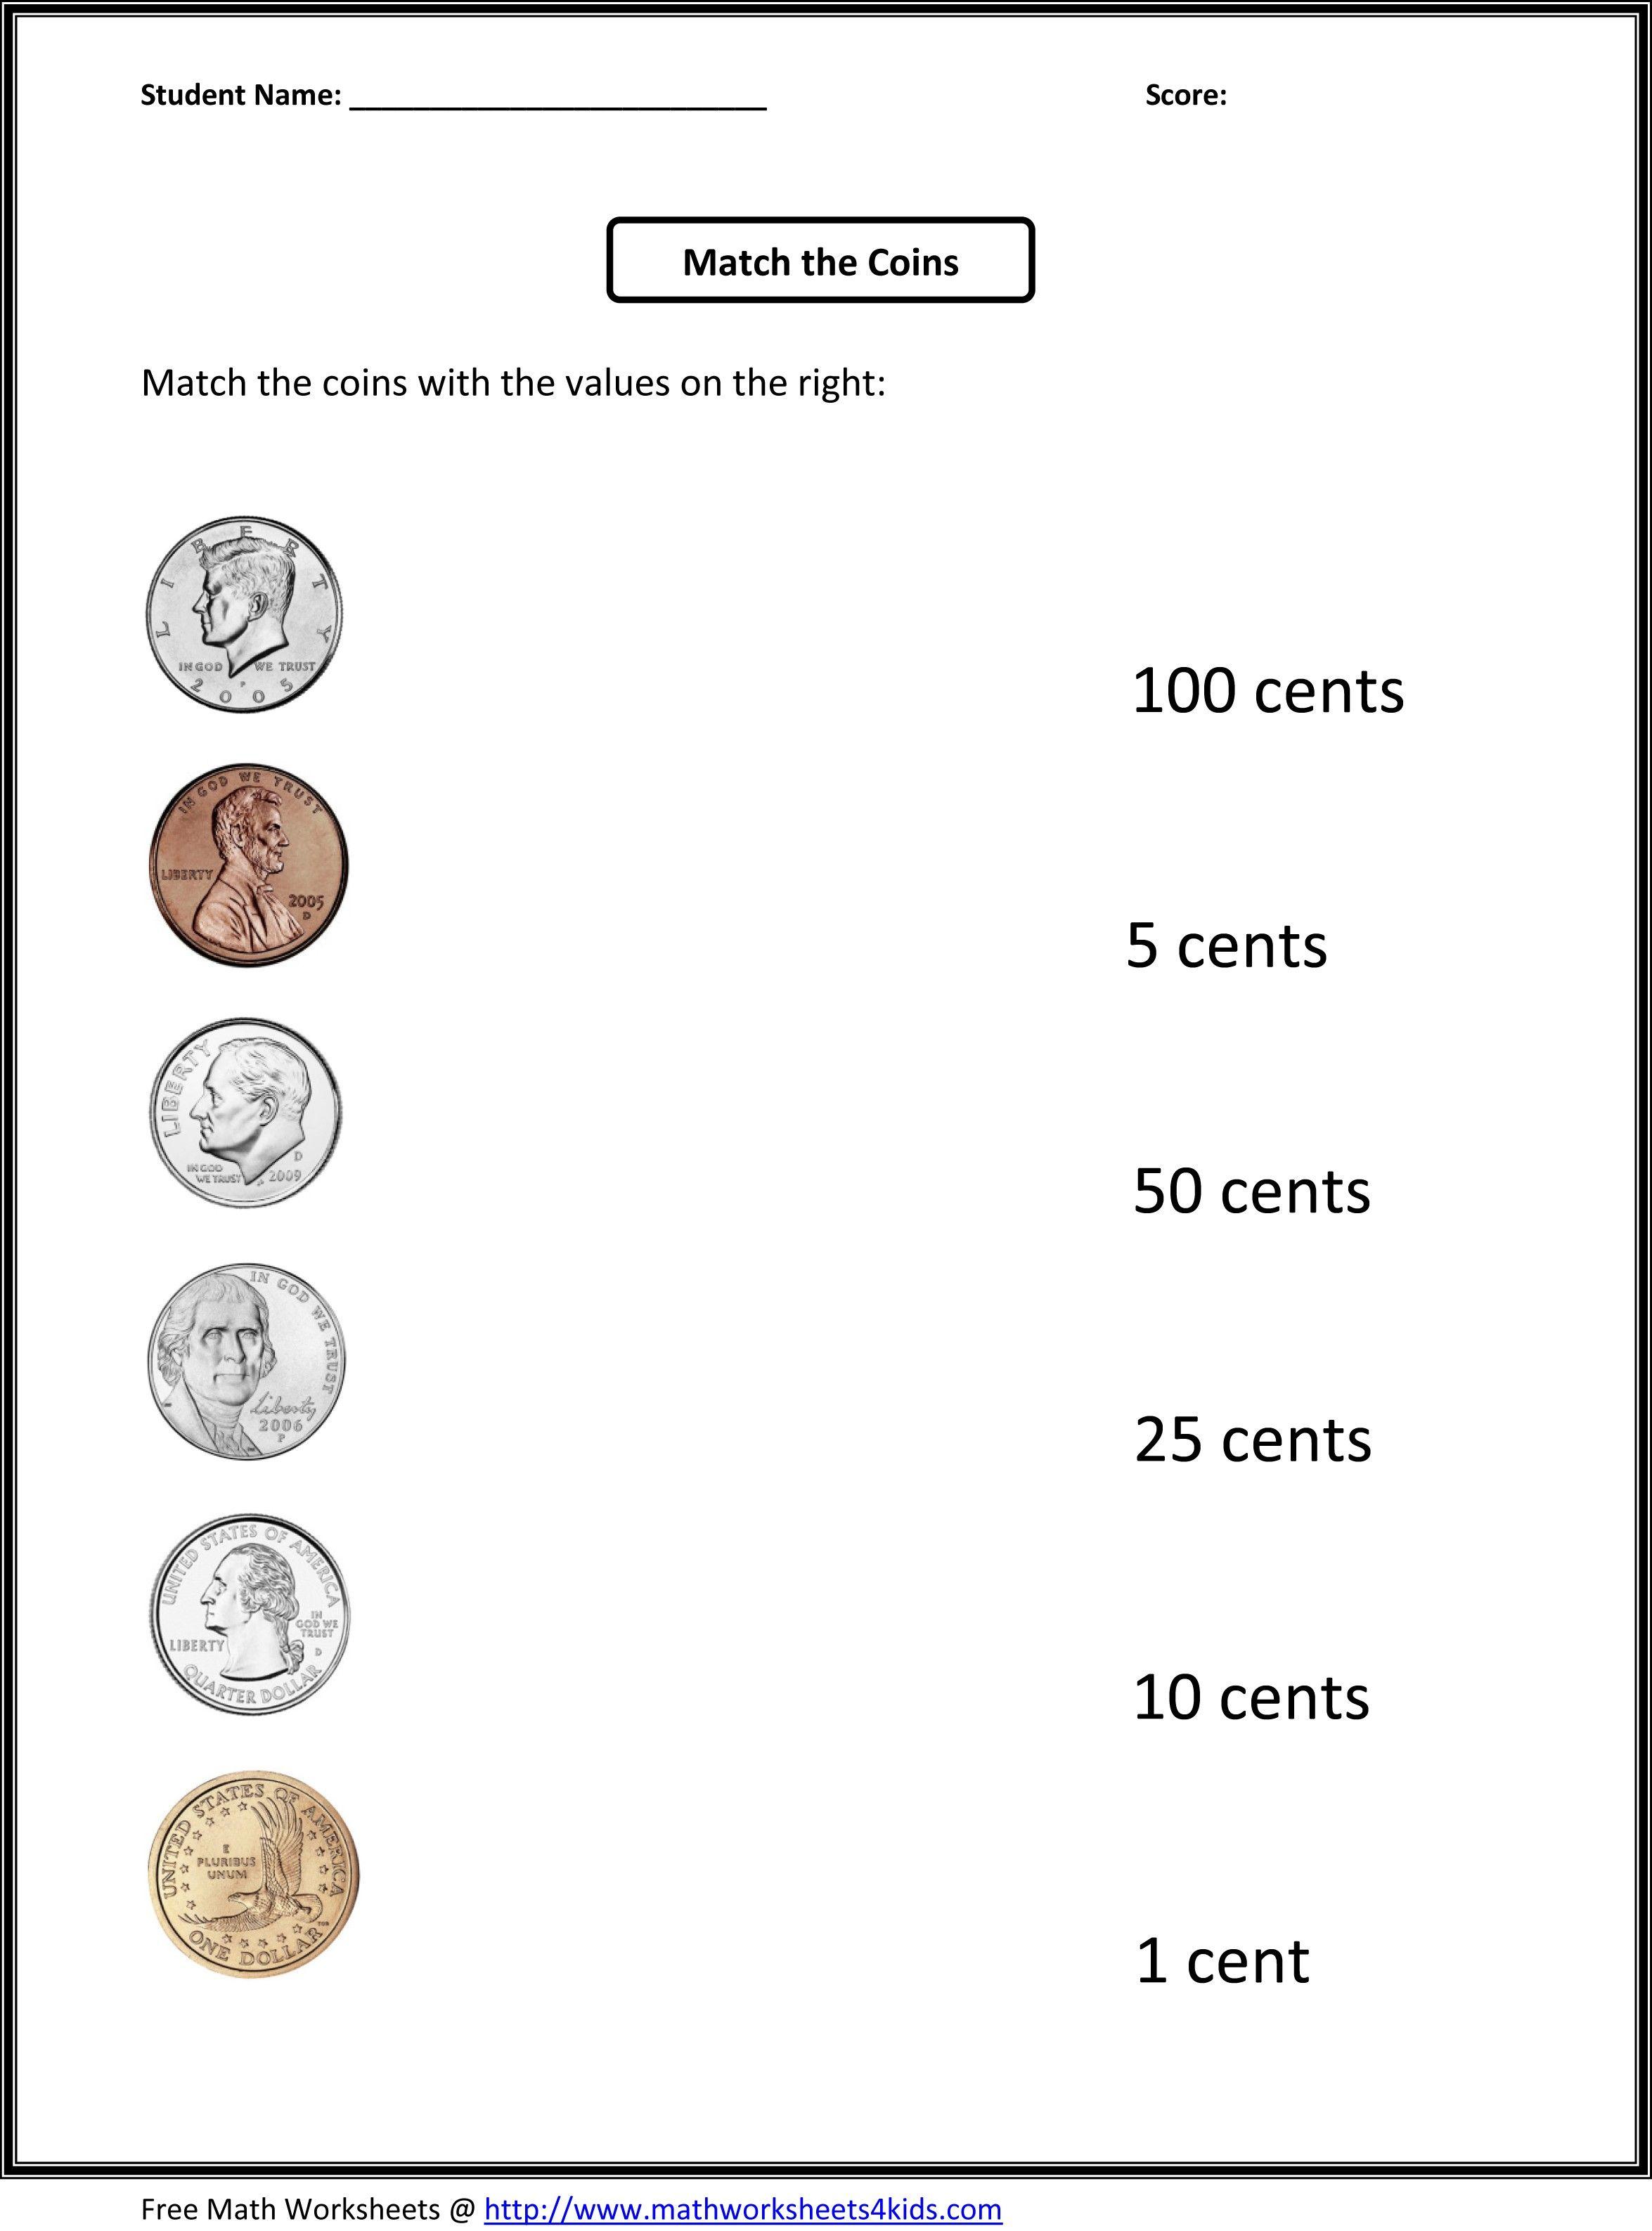 First Grade Money Worksheets Free Printable | Education (For The - Free Printable Money Worksheets For Kindergarten